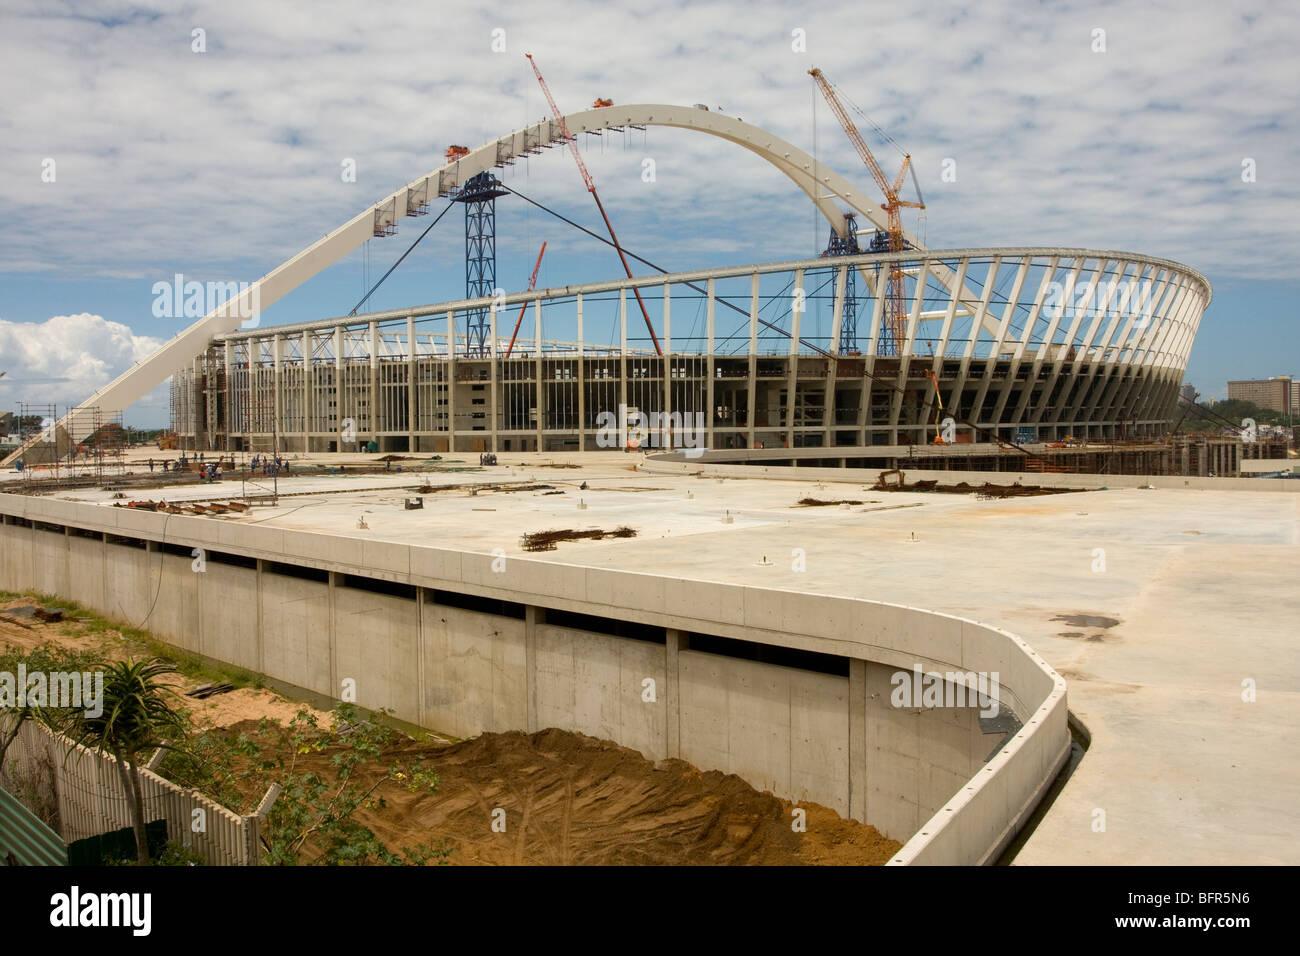 Durban's new King Senzangakhona Stadium which will host a 2010 Fifa World Cup semi-final. - Stock Image